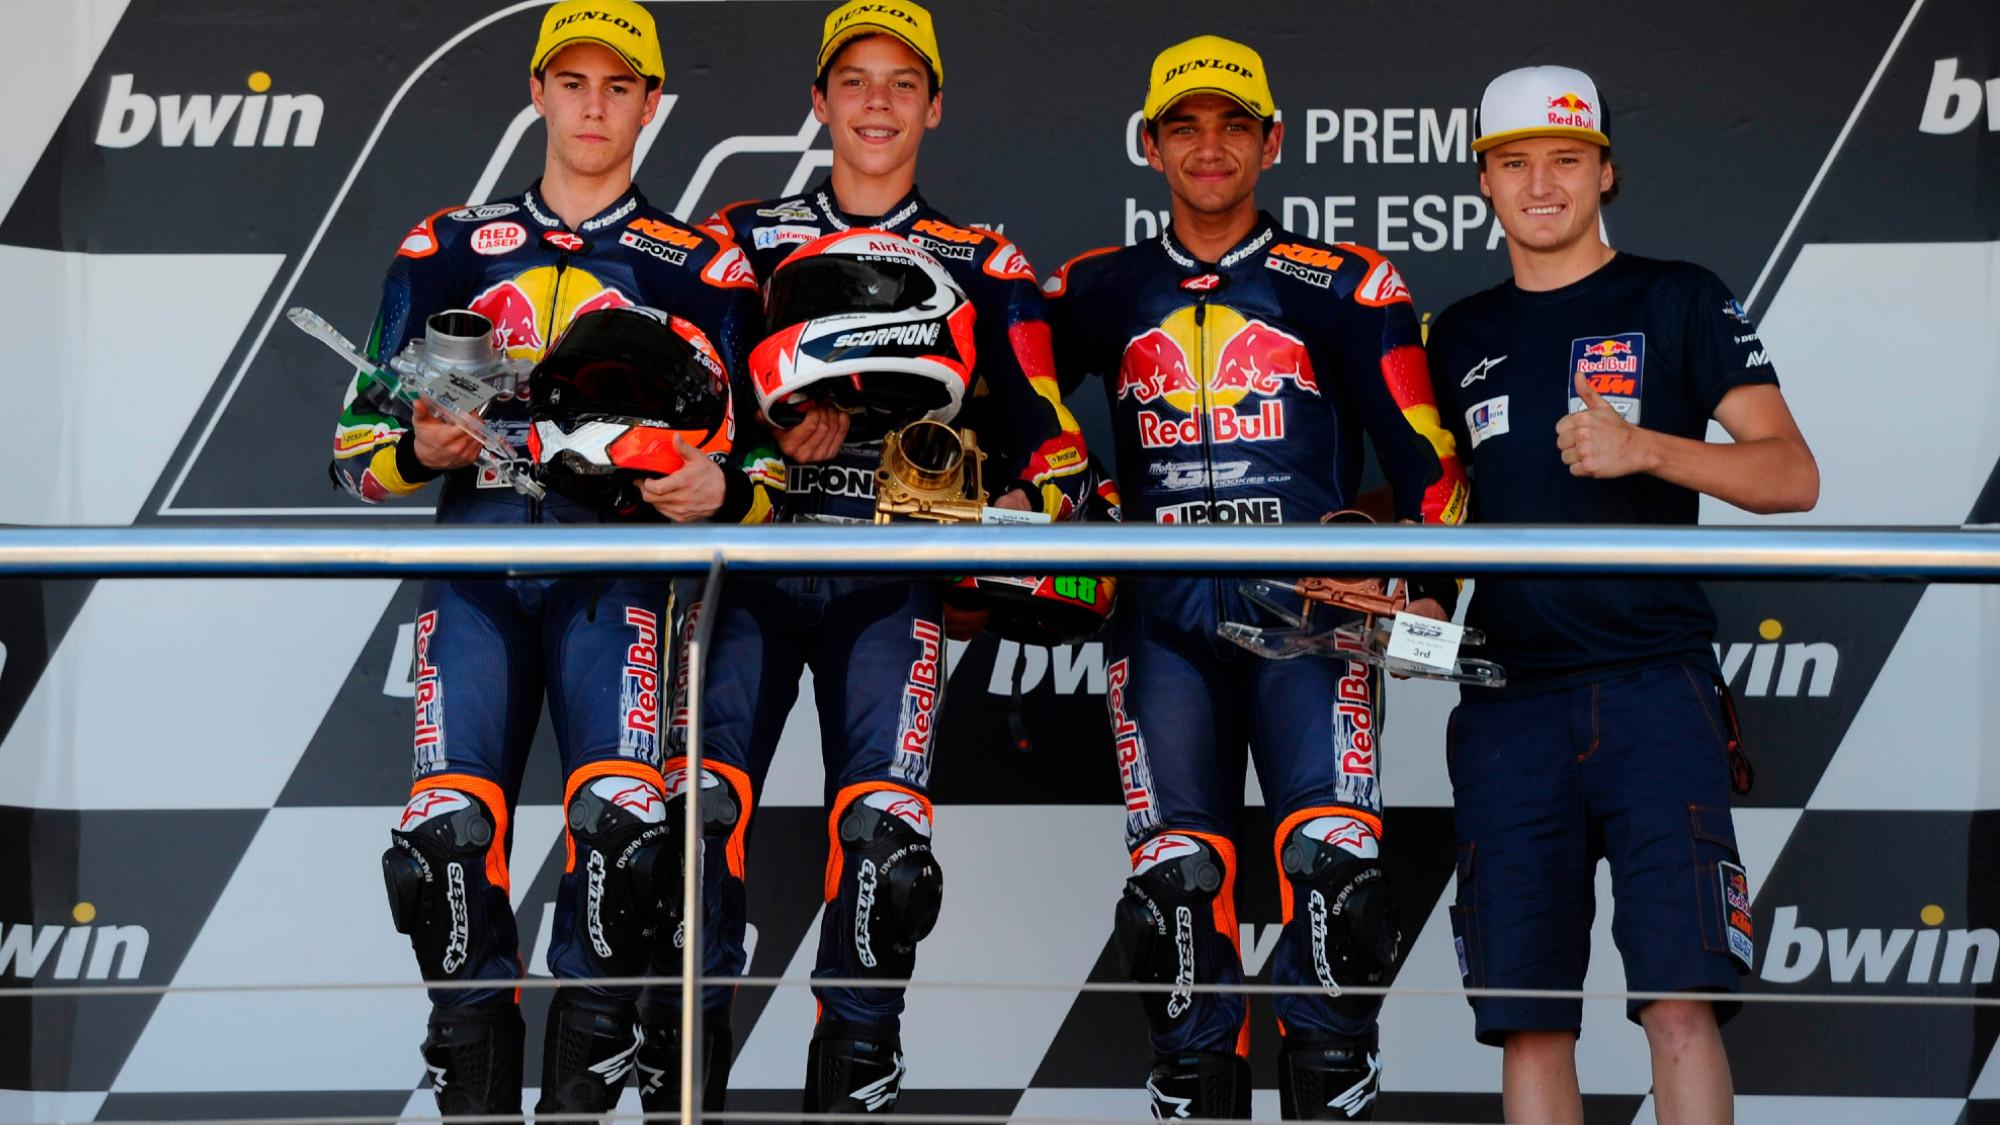 2014 Jorge Martin, Red Bull KTM